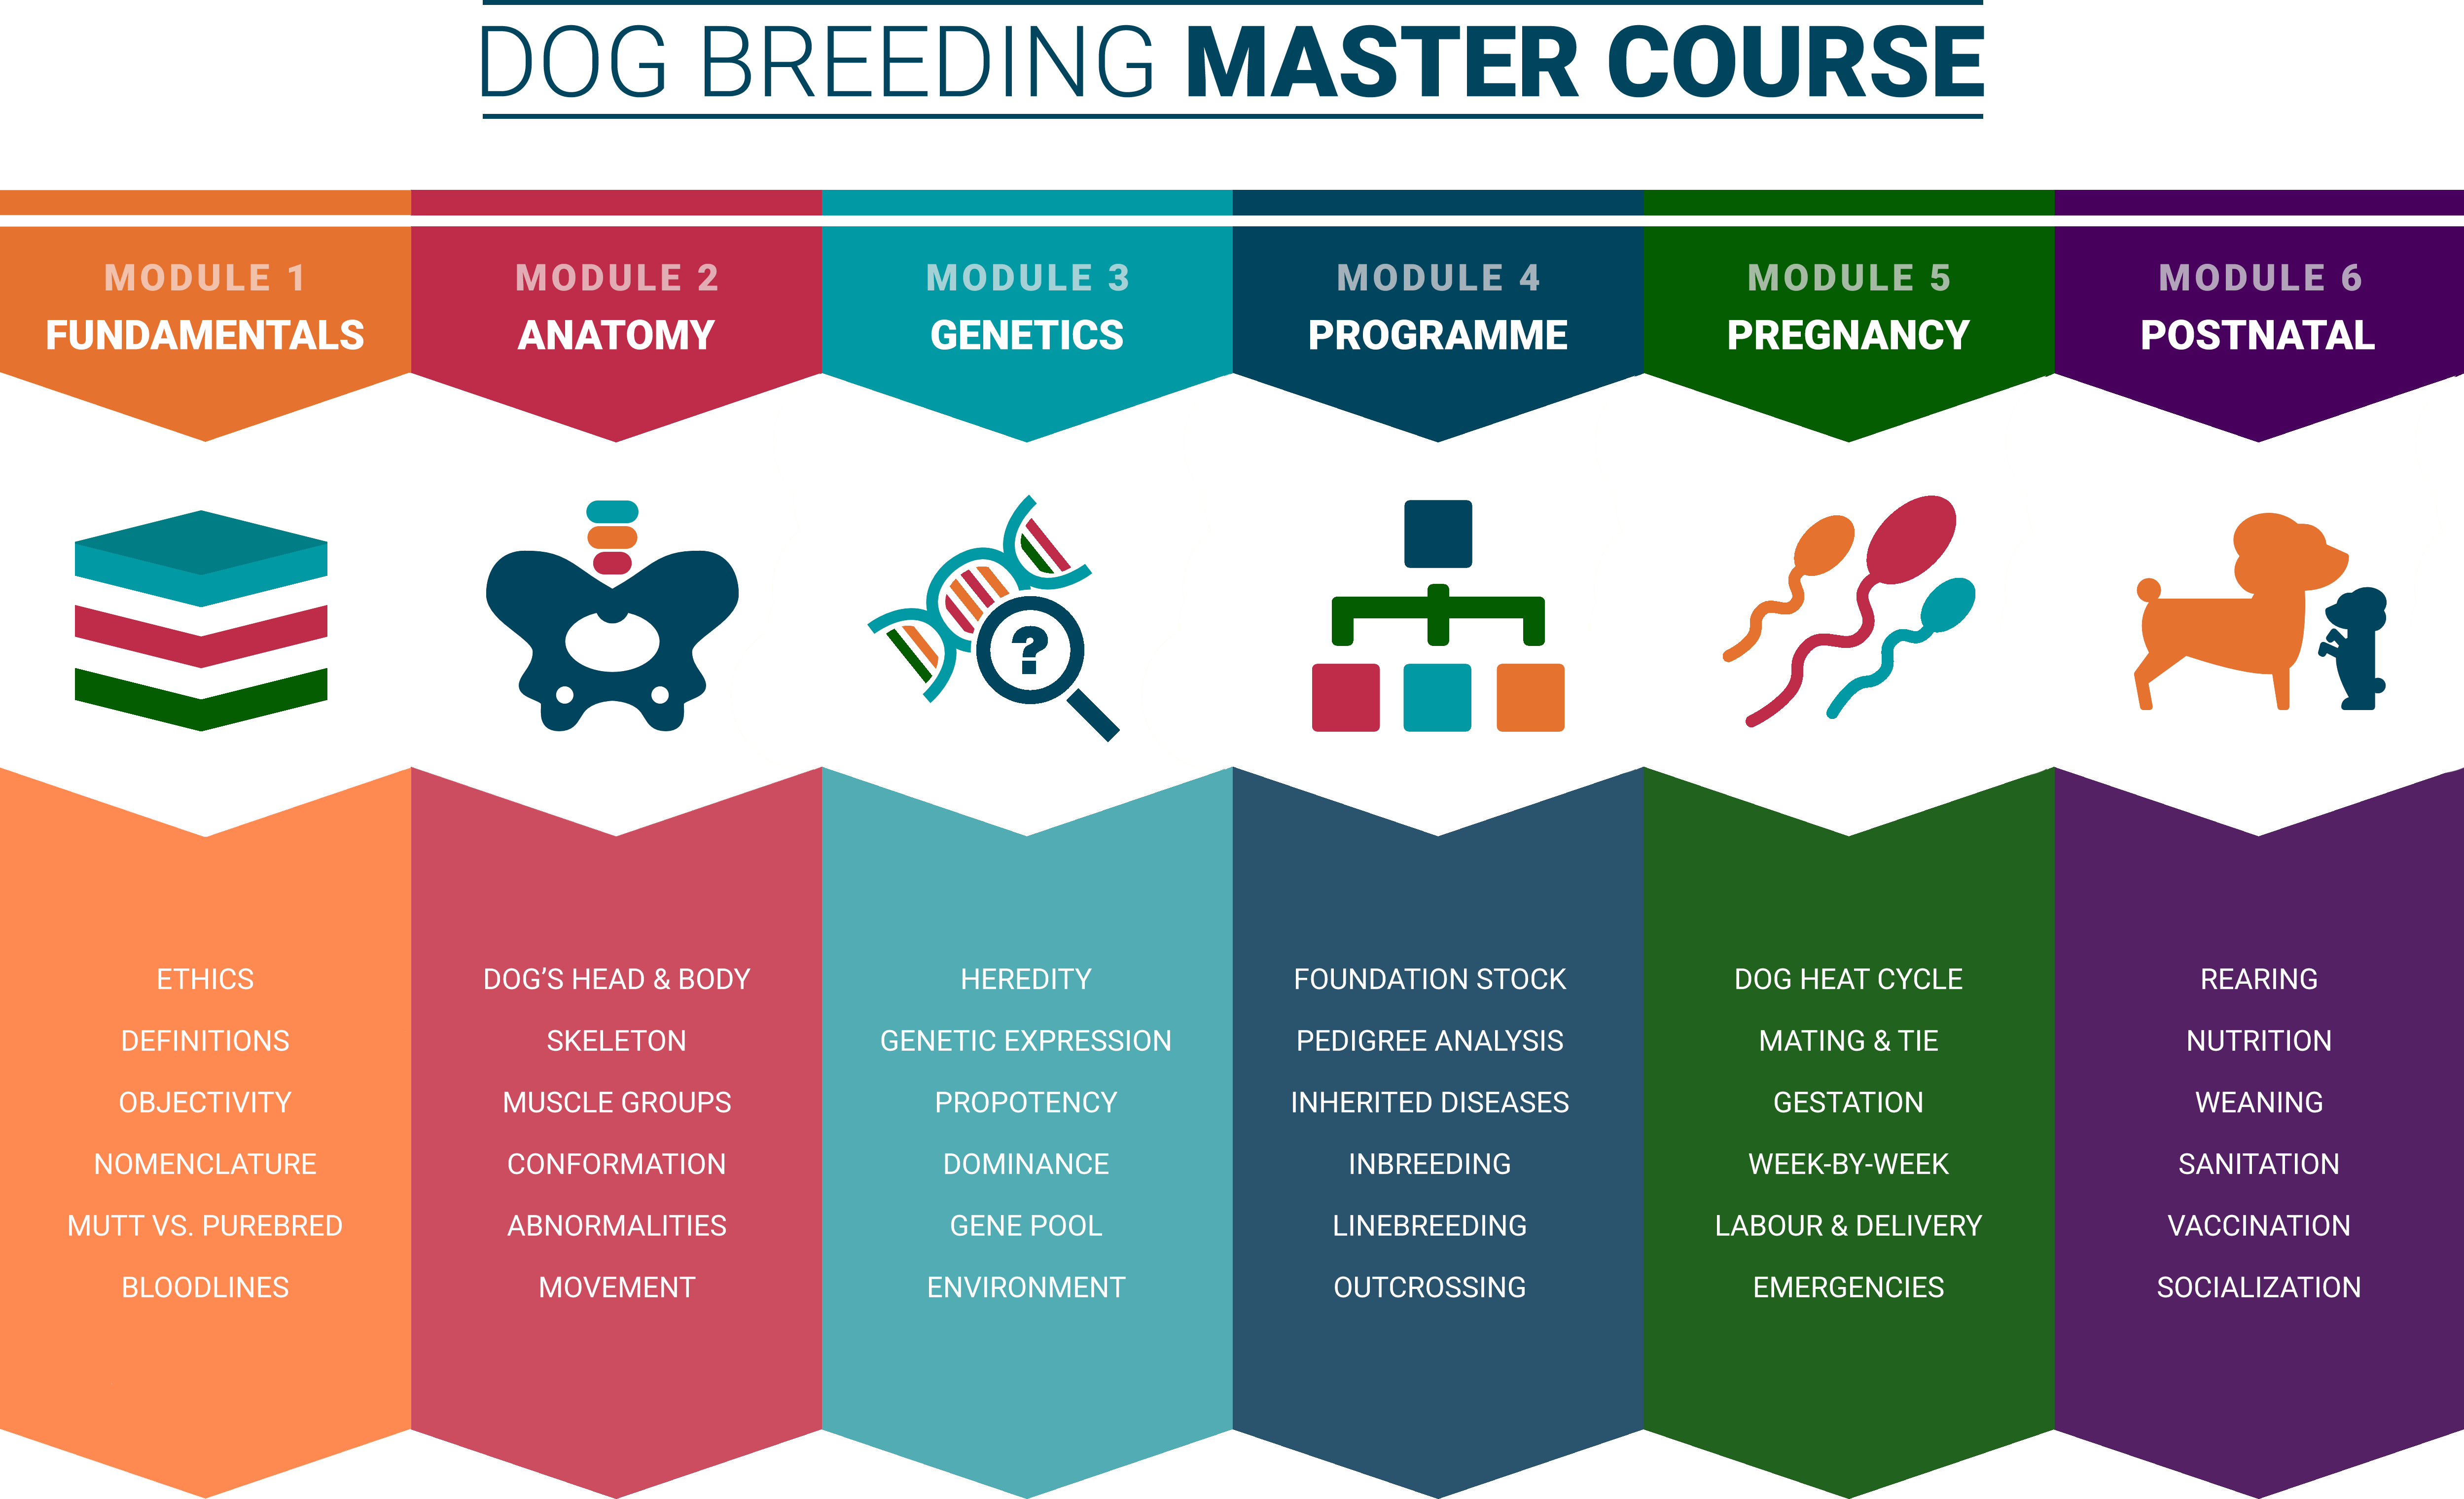 Dog Breeding Master Course Modules